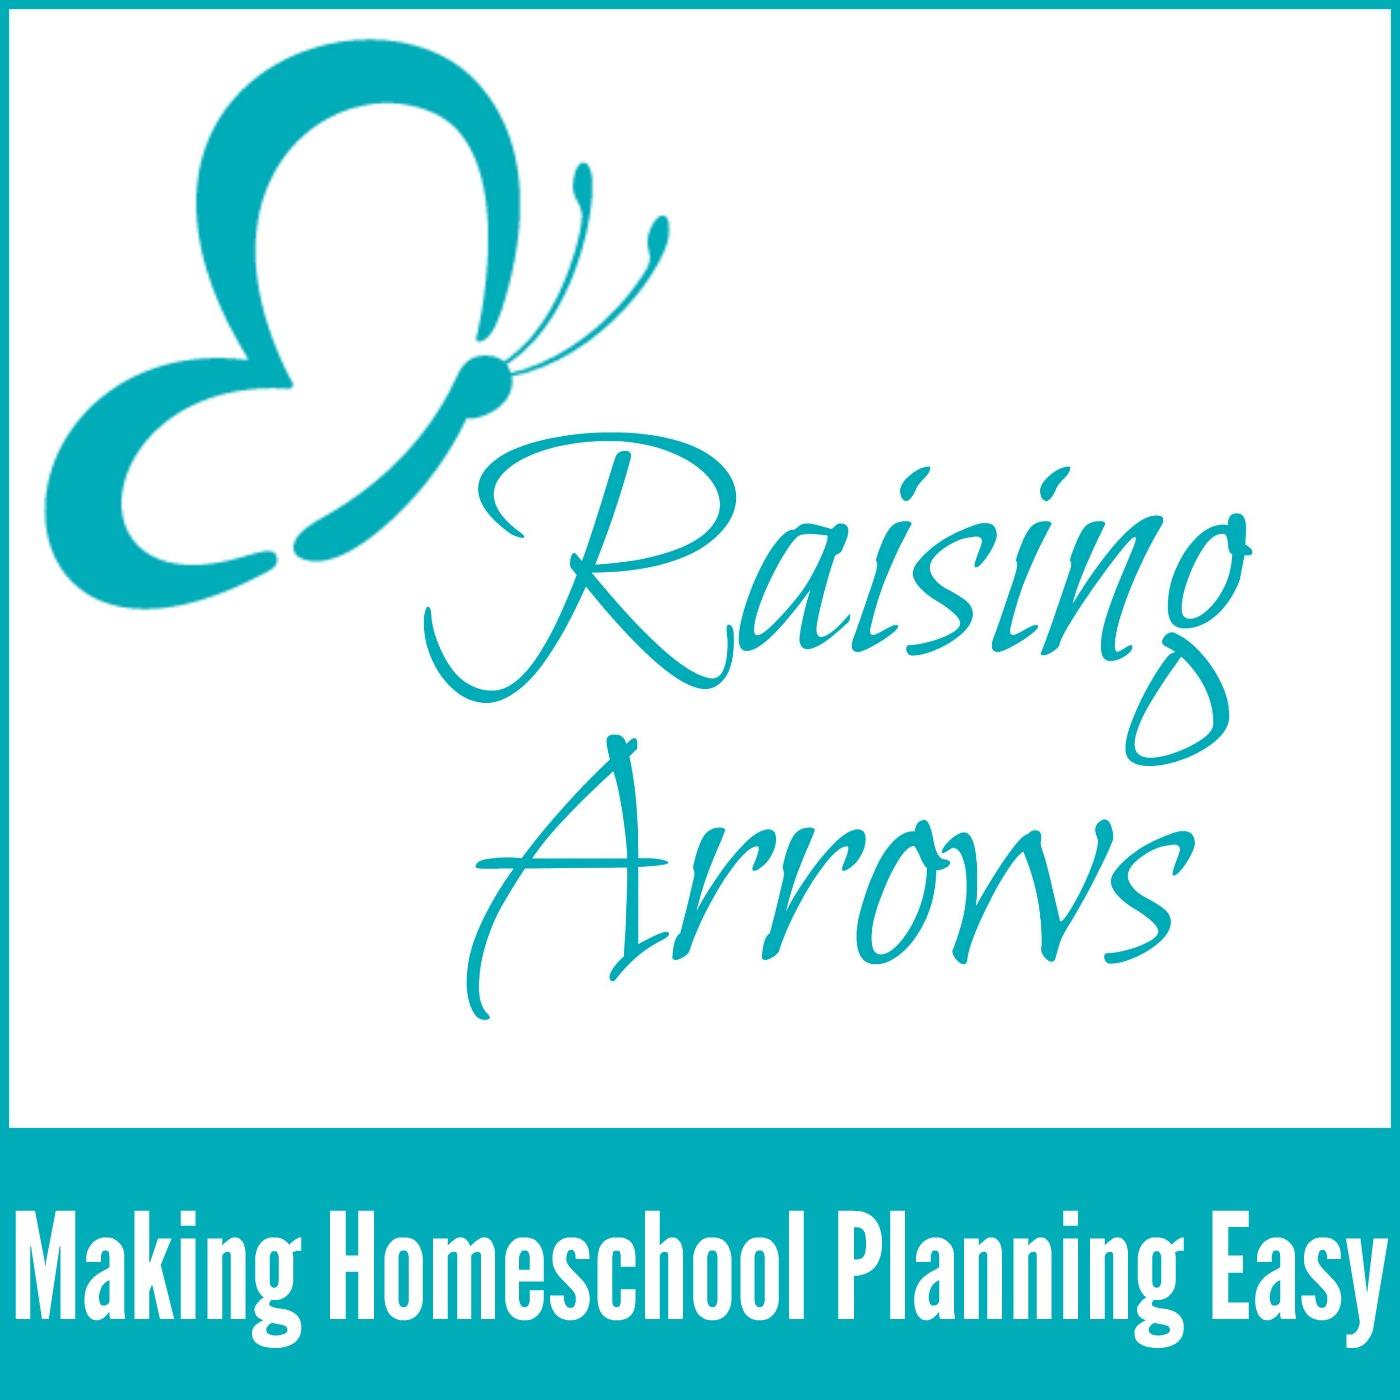 004 Podcast – Making Homeschool Planning Easy